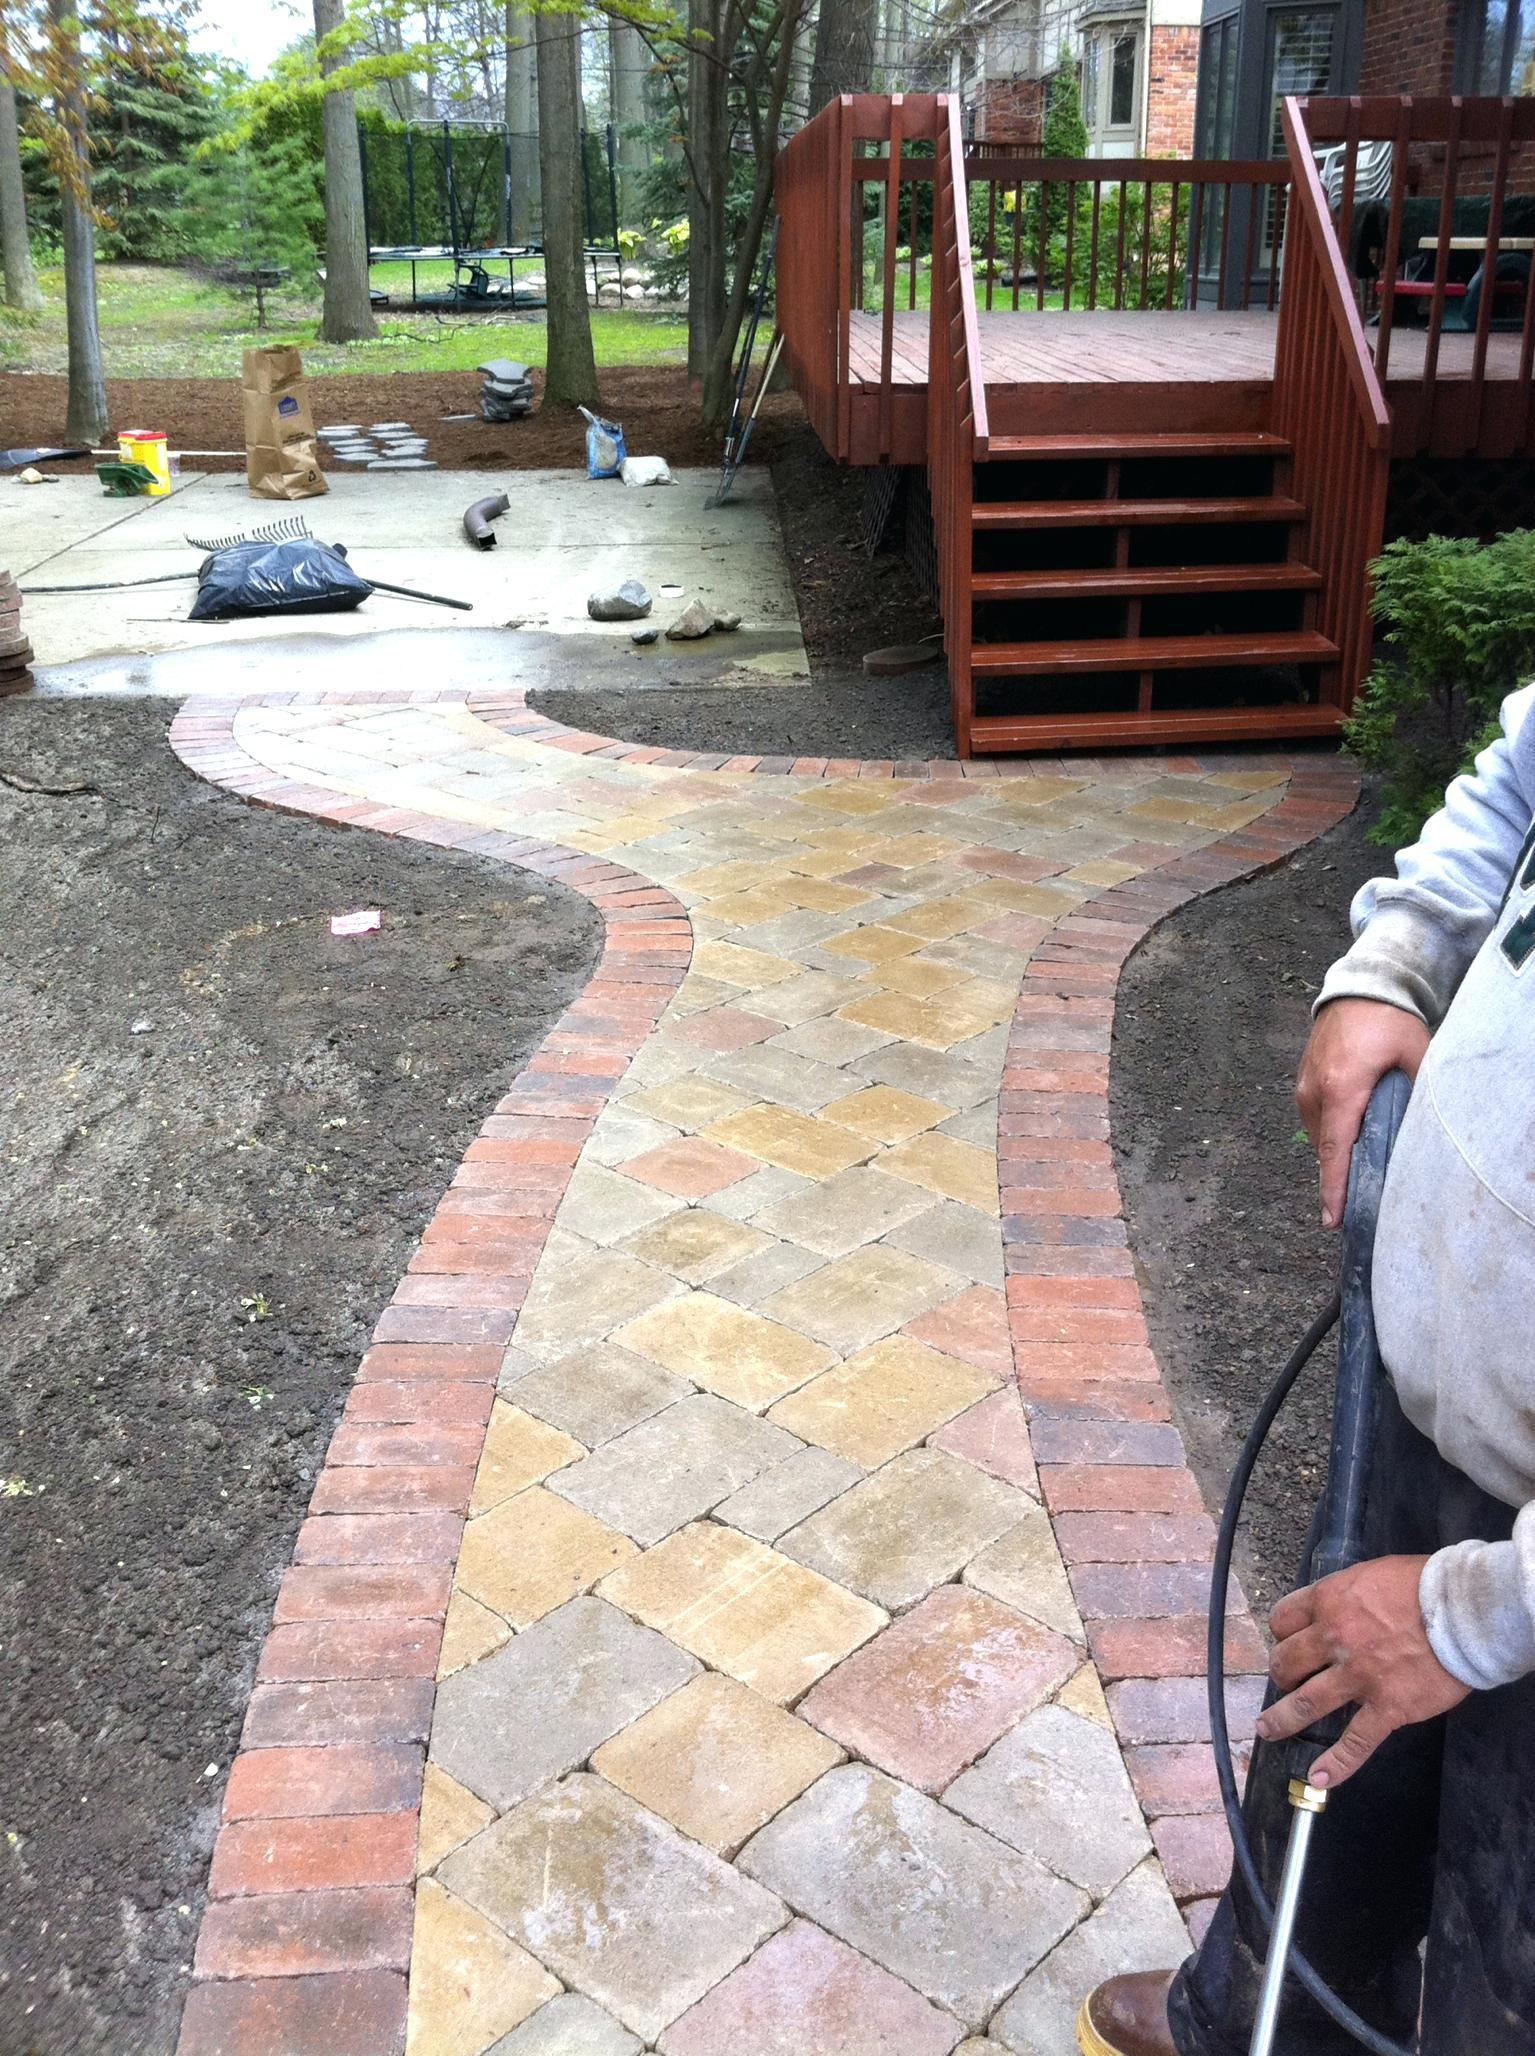 Patio Design:Brick Walkway Paver Patio Calculator Designs Photos Porch Cool  Design Backyard Full Size